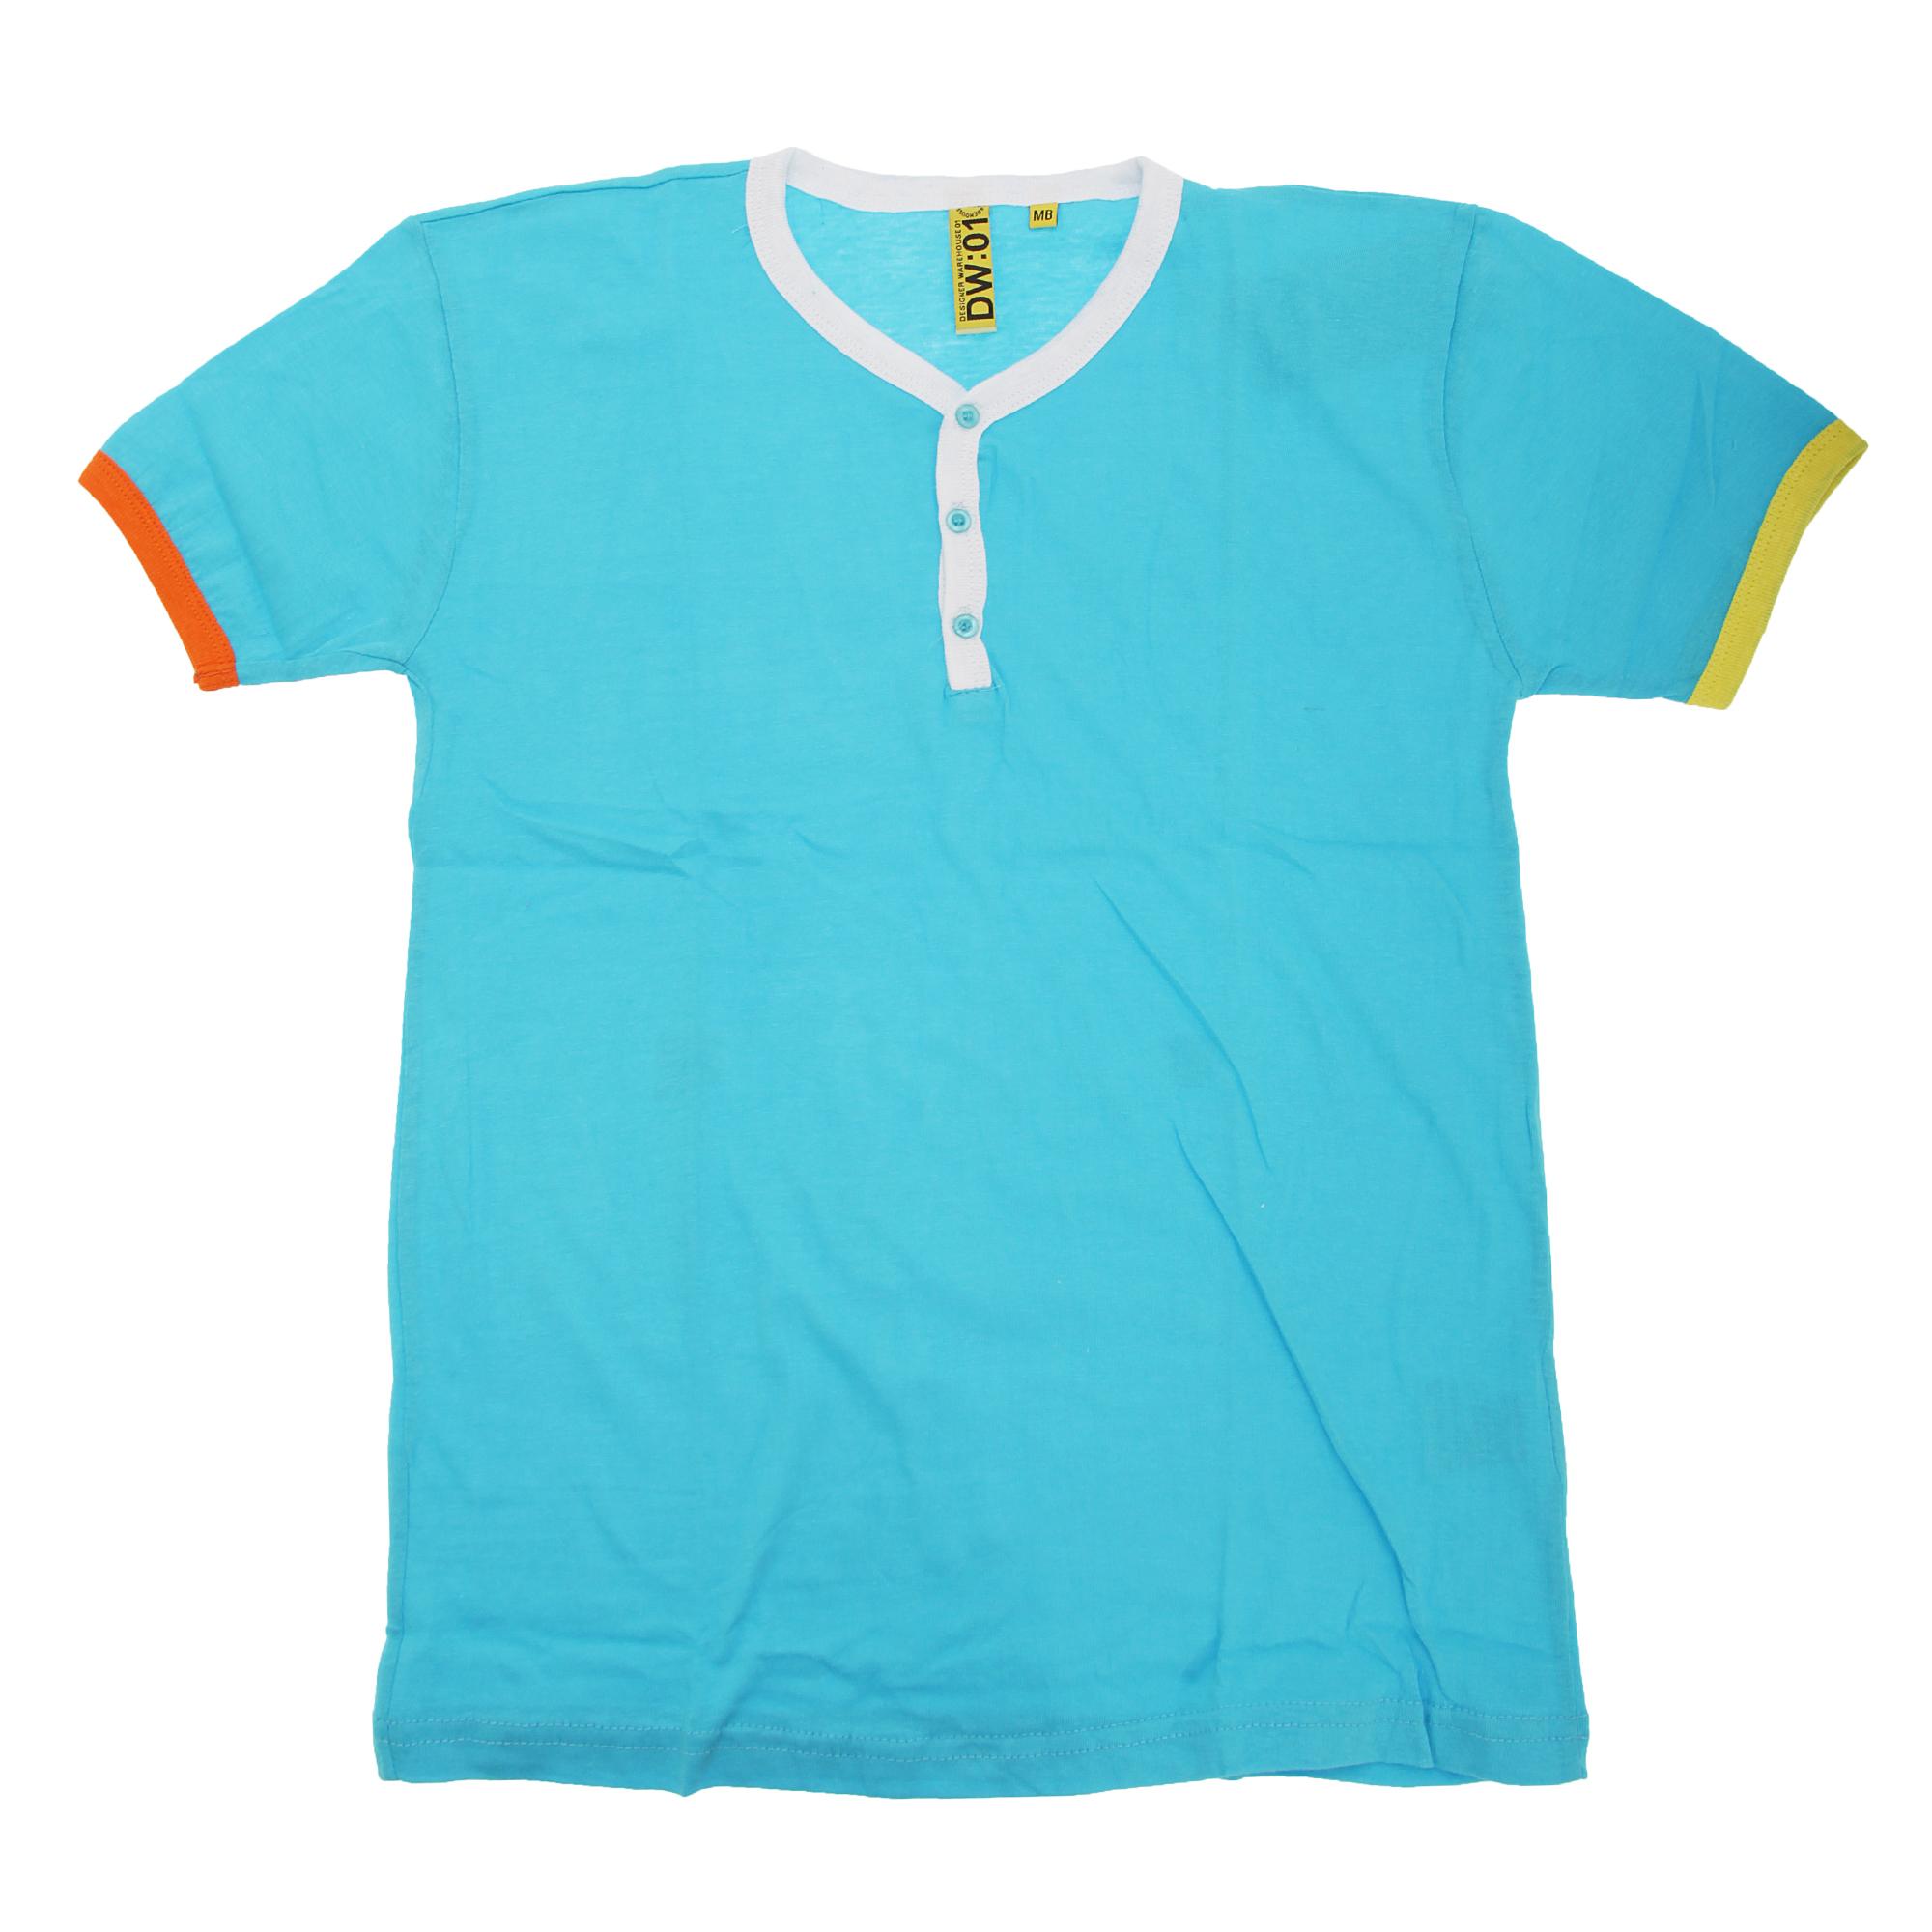 unisex boys girls short sleeve summer t shirt with colour. Black Bedroom Furniture Sets. Home Design Ideas